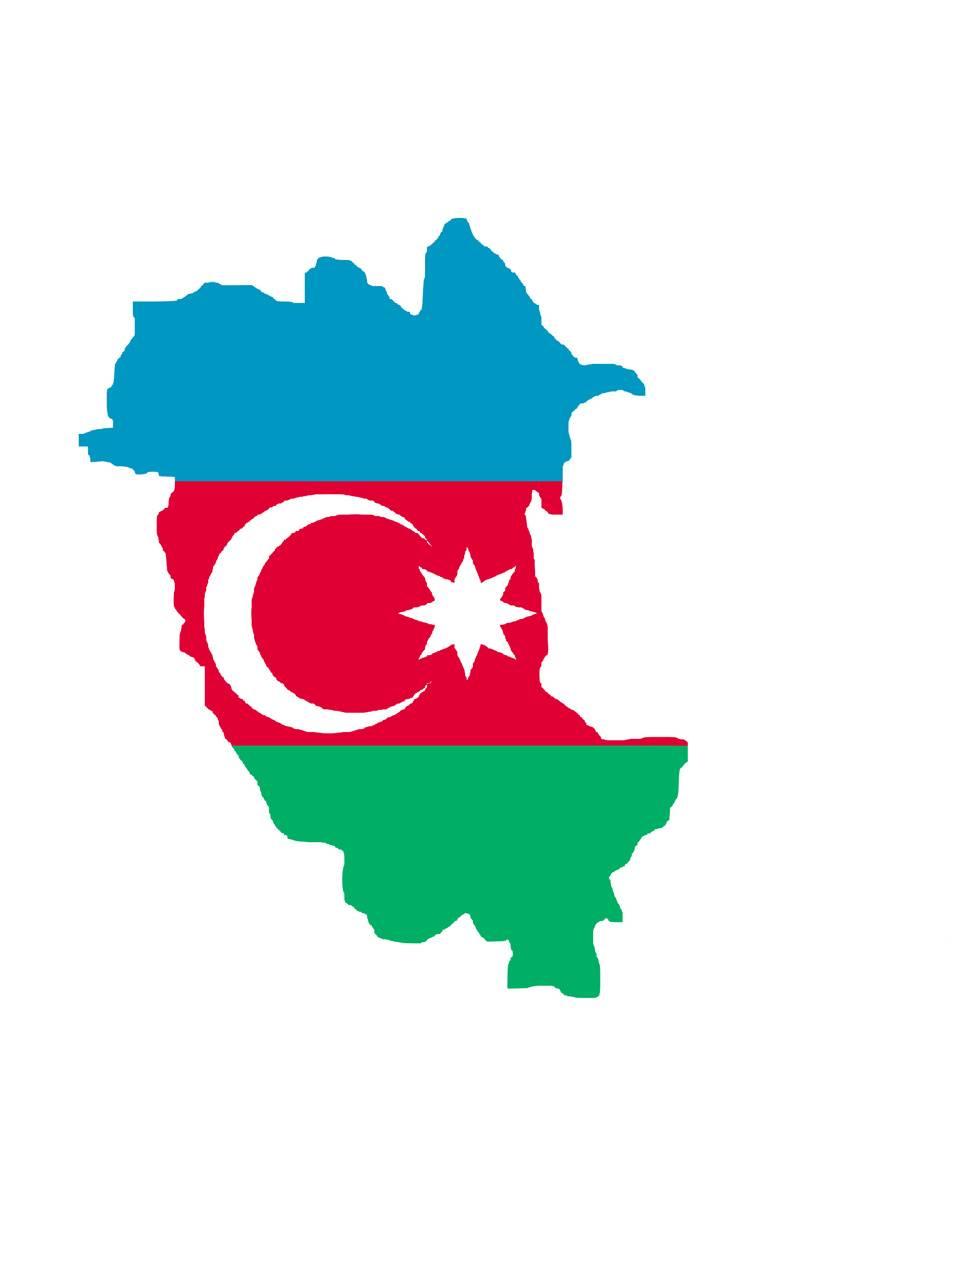 Map of Azerbaijan